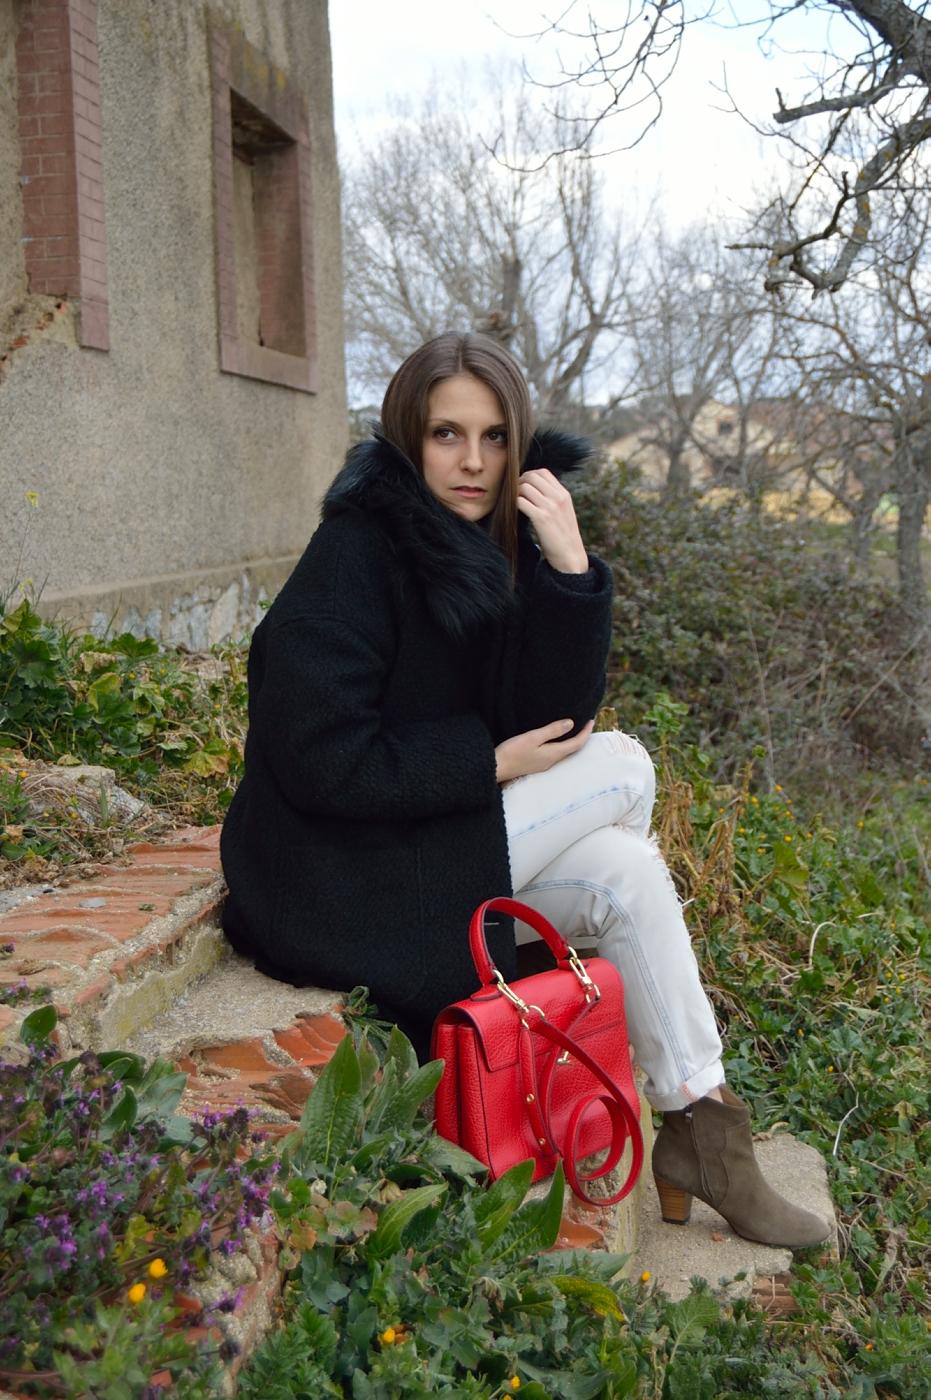 lara-vazquez-mad-lula-style-streetstyle-look-ootd-chic-lady